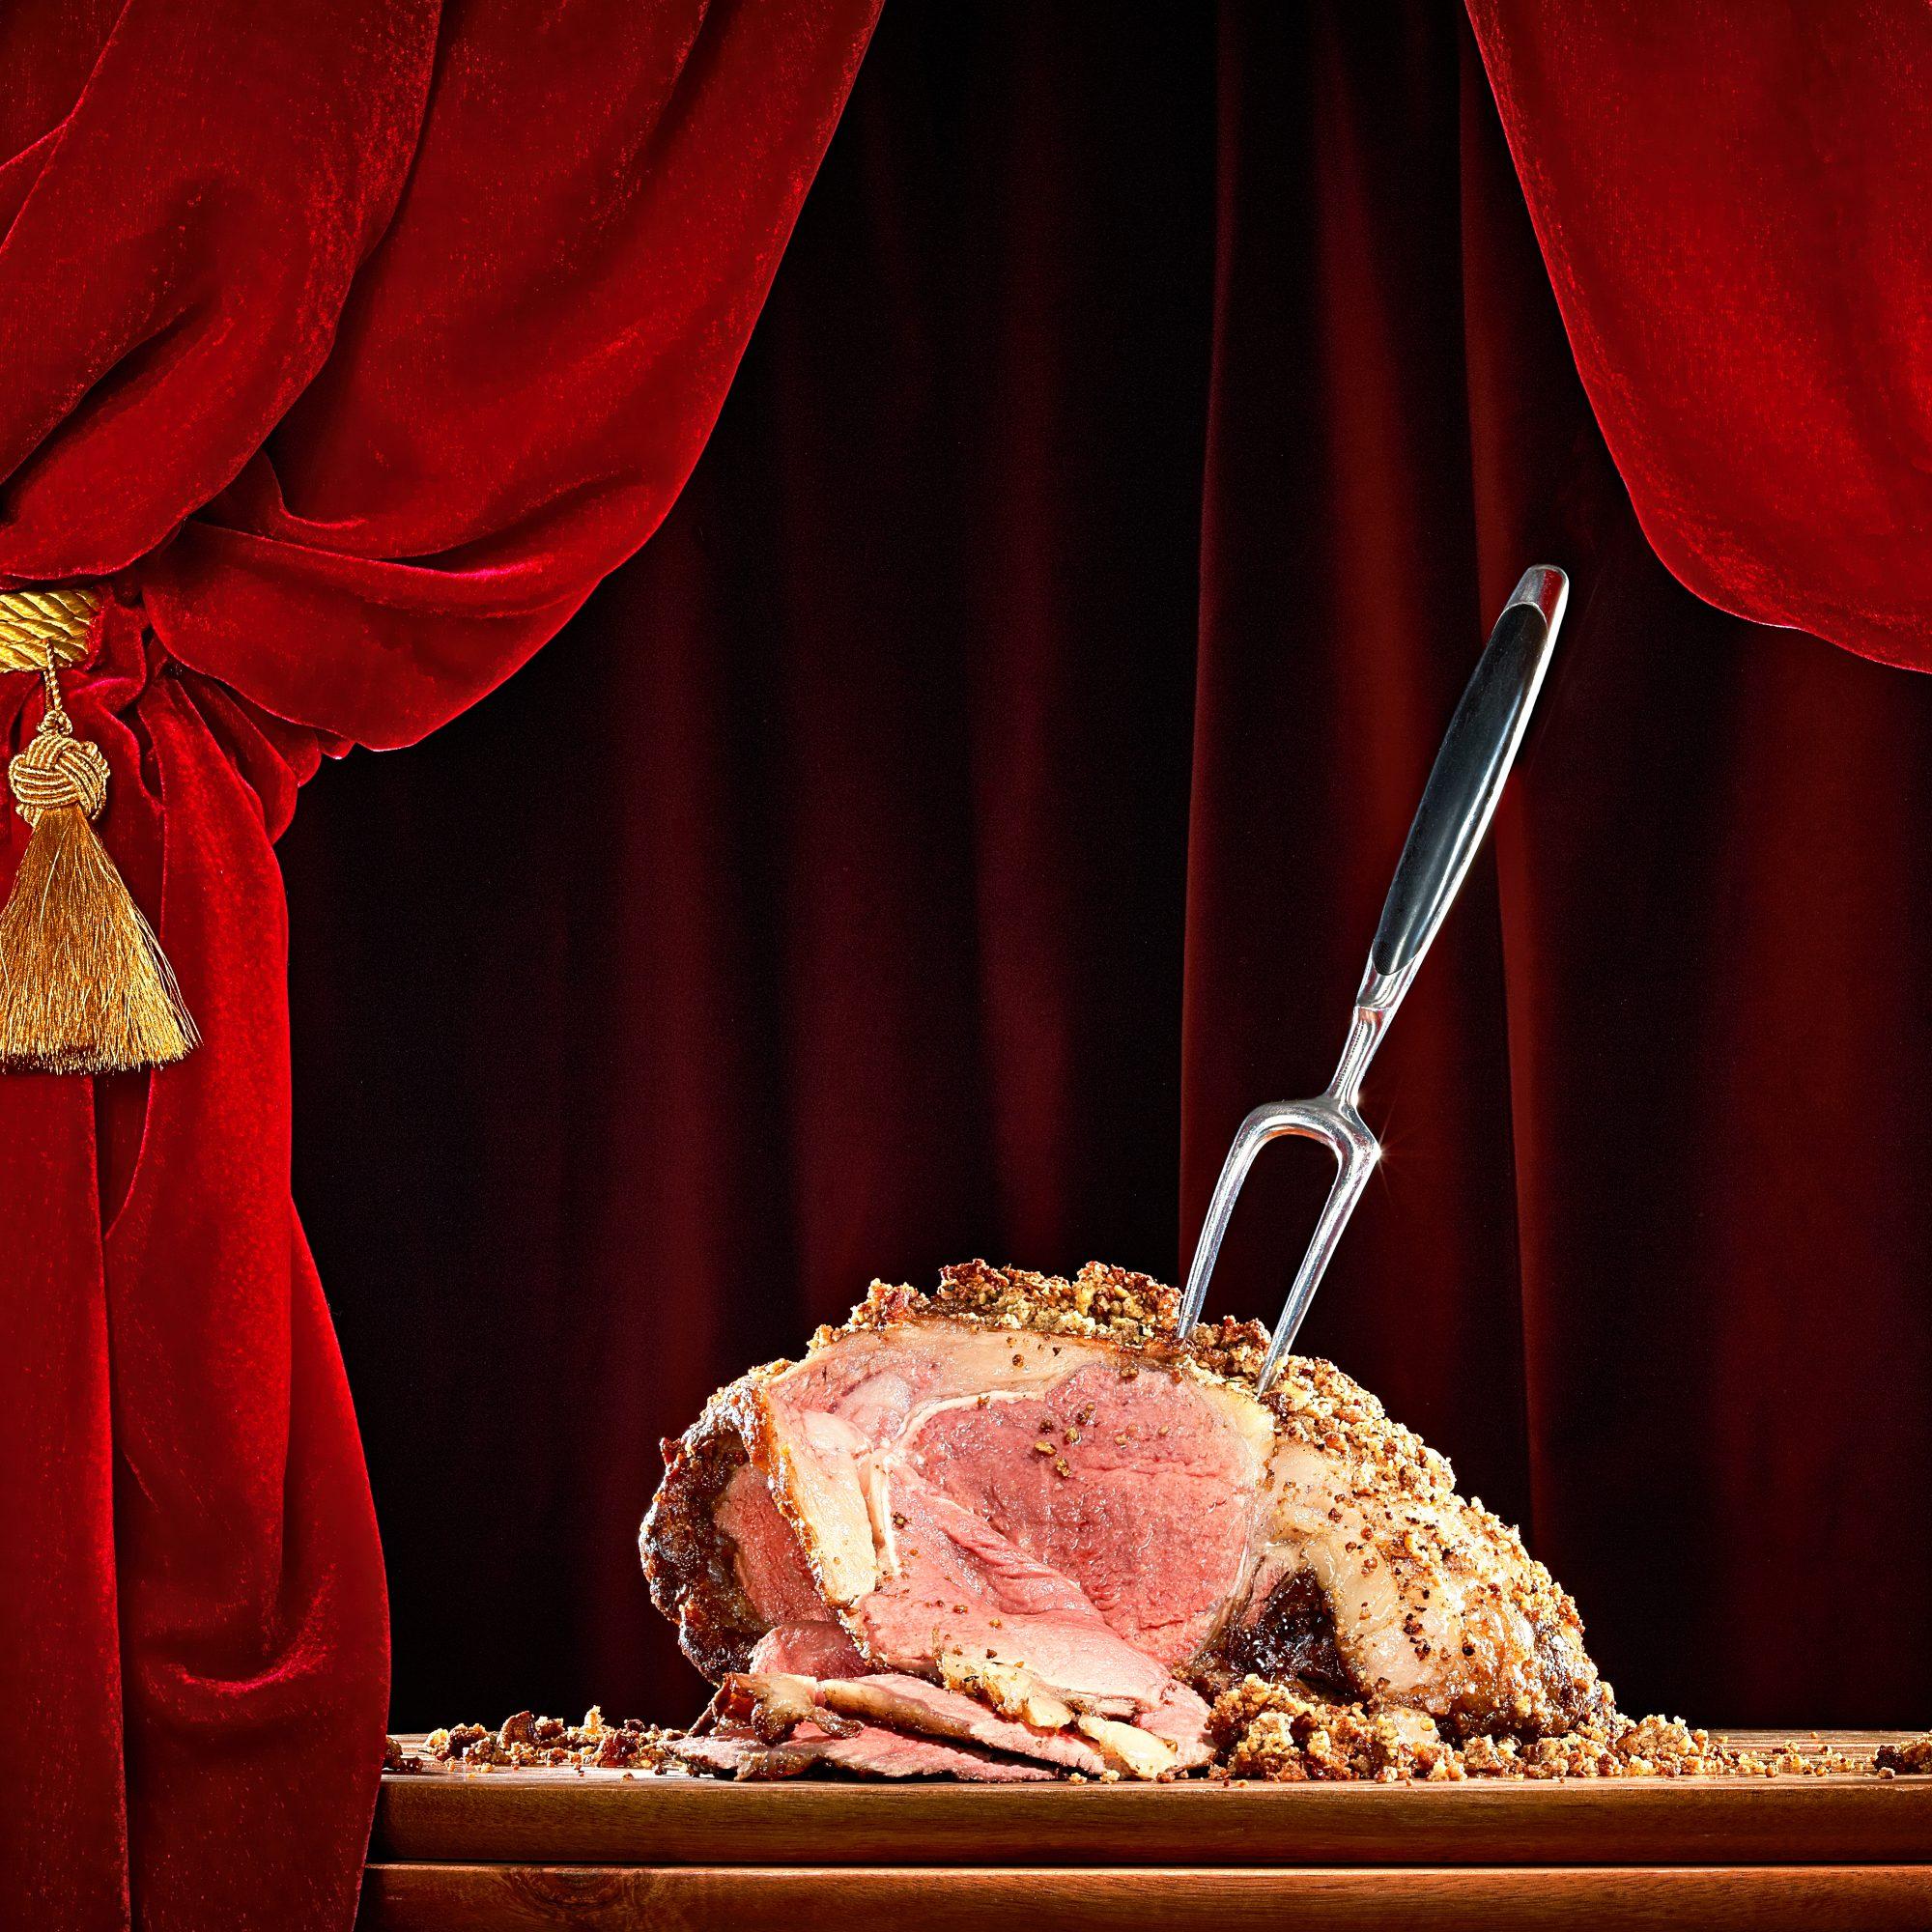 Pecan-Crusted Beef Rib Roast